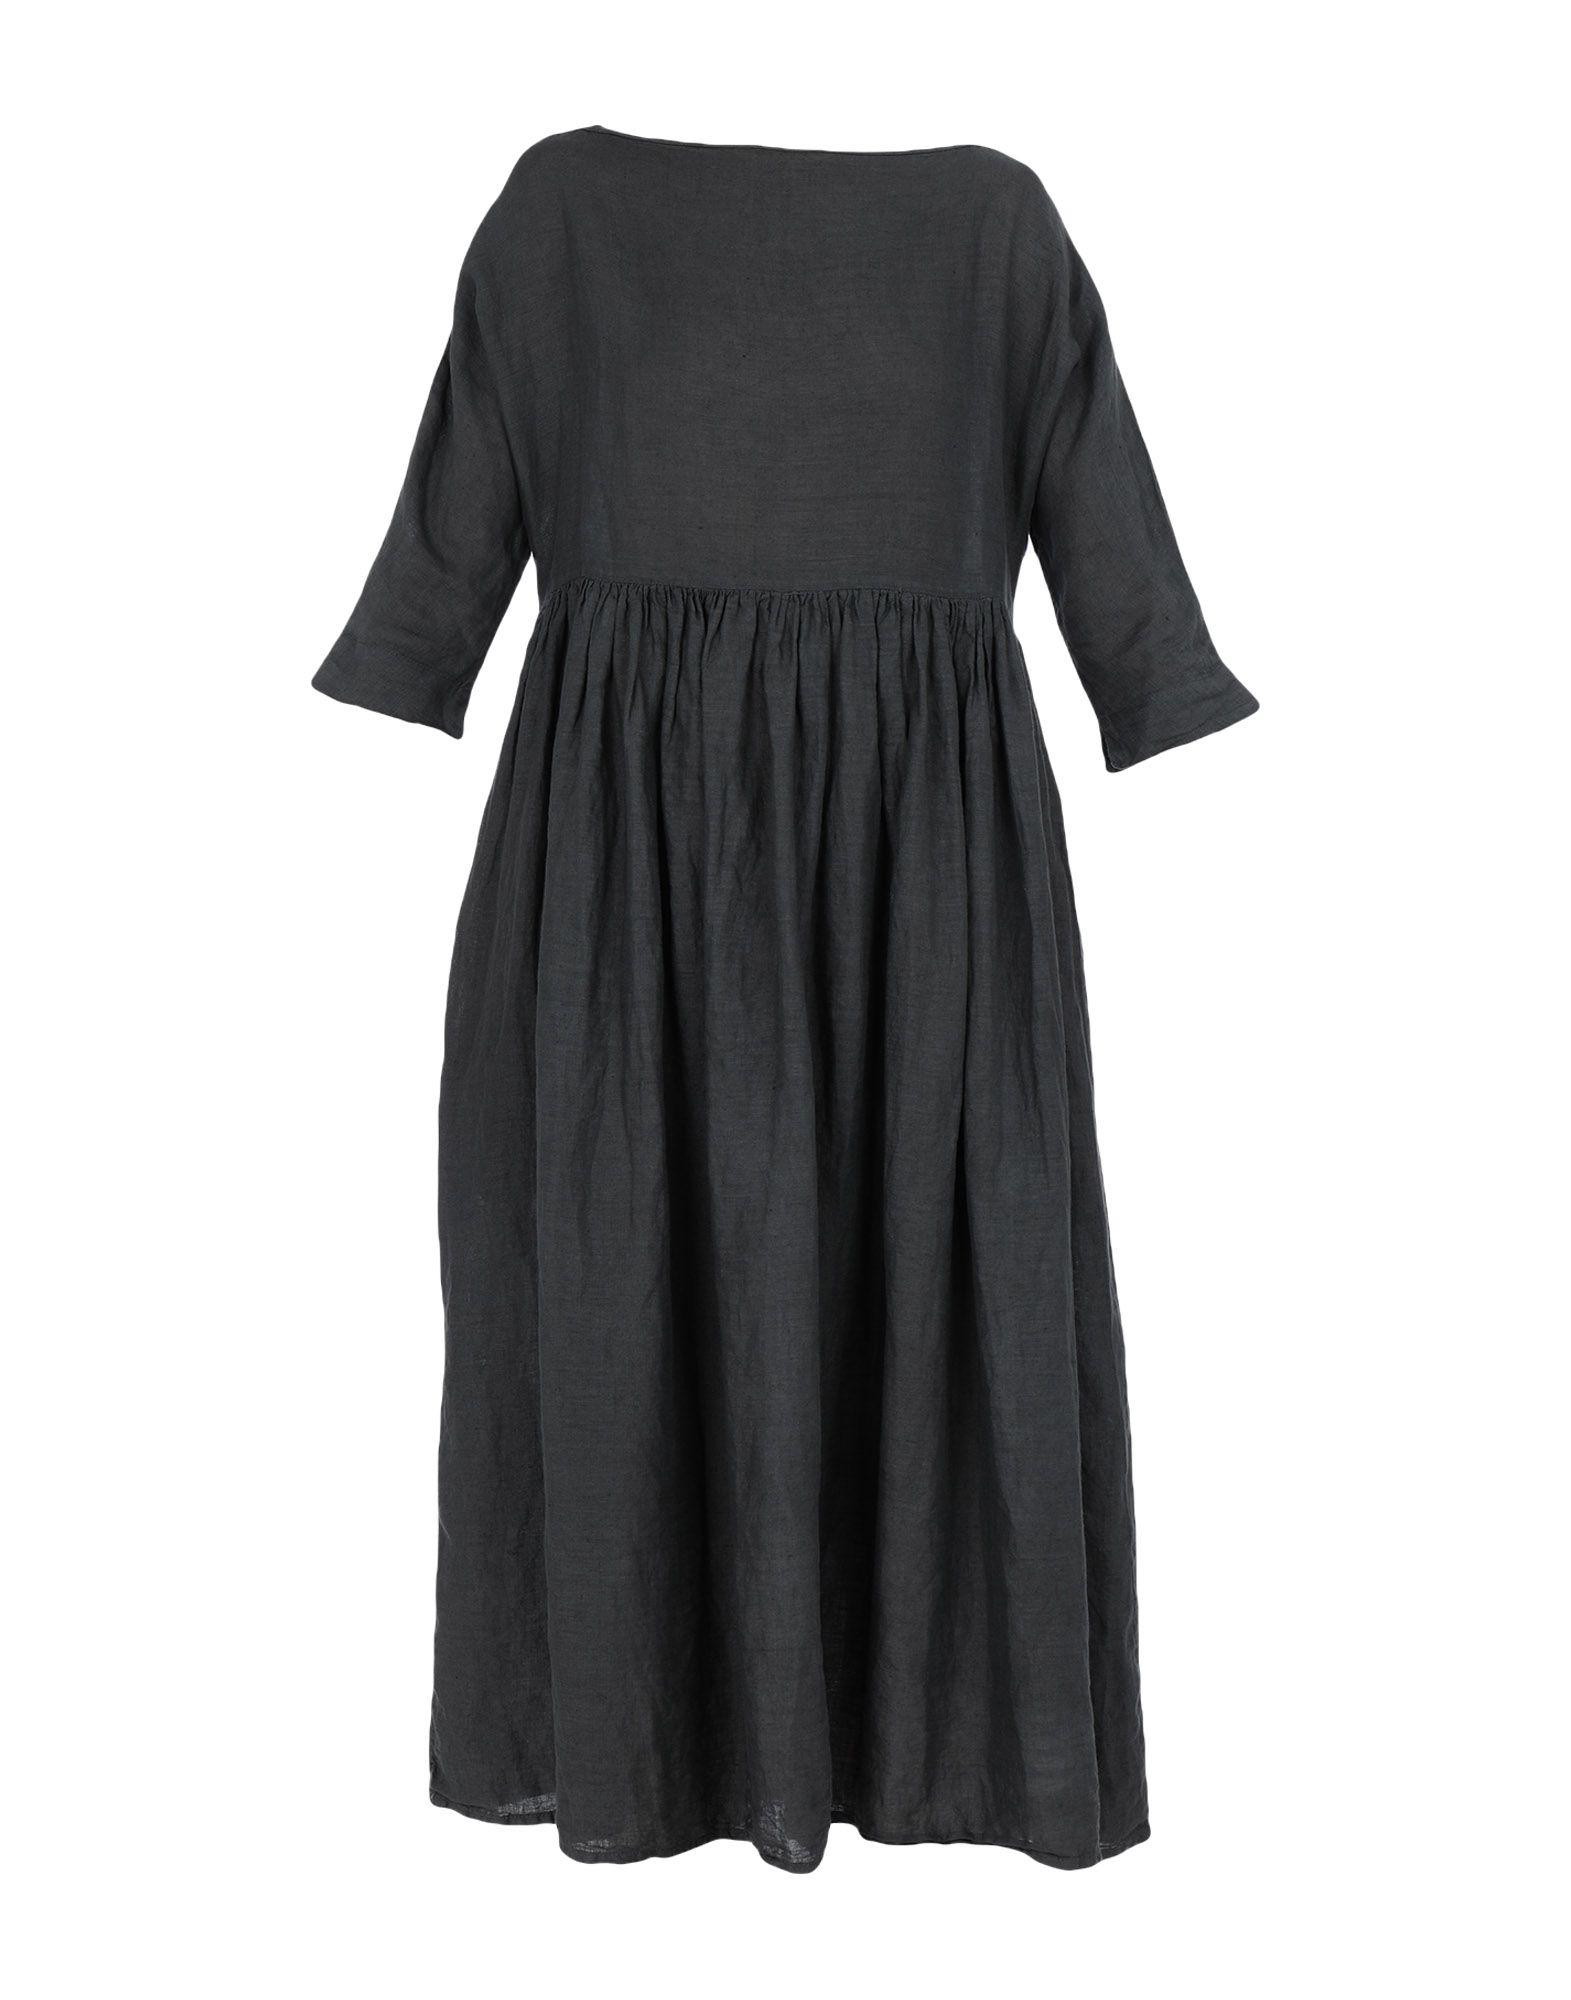 METTA MELBOURNE Платье длиной 3/4 cher melbourne